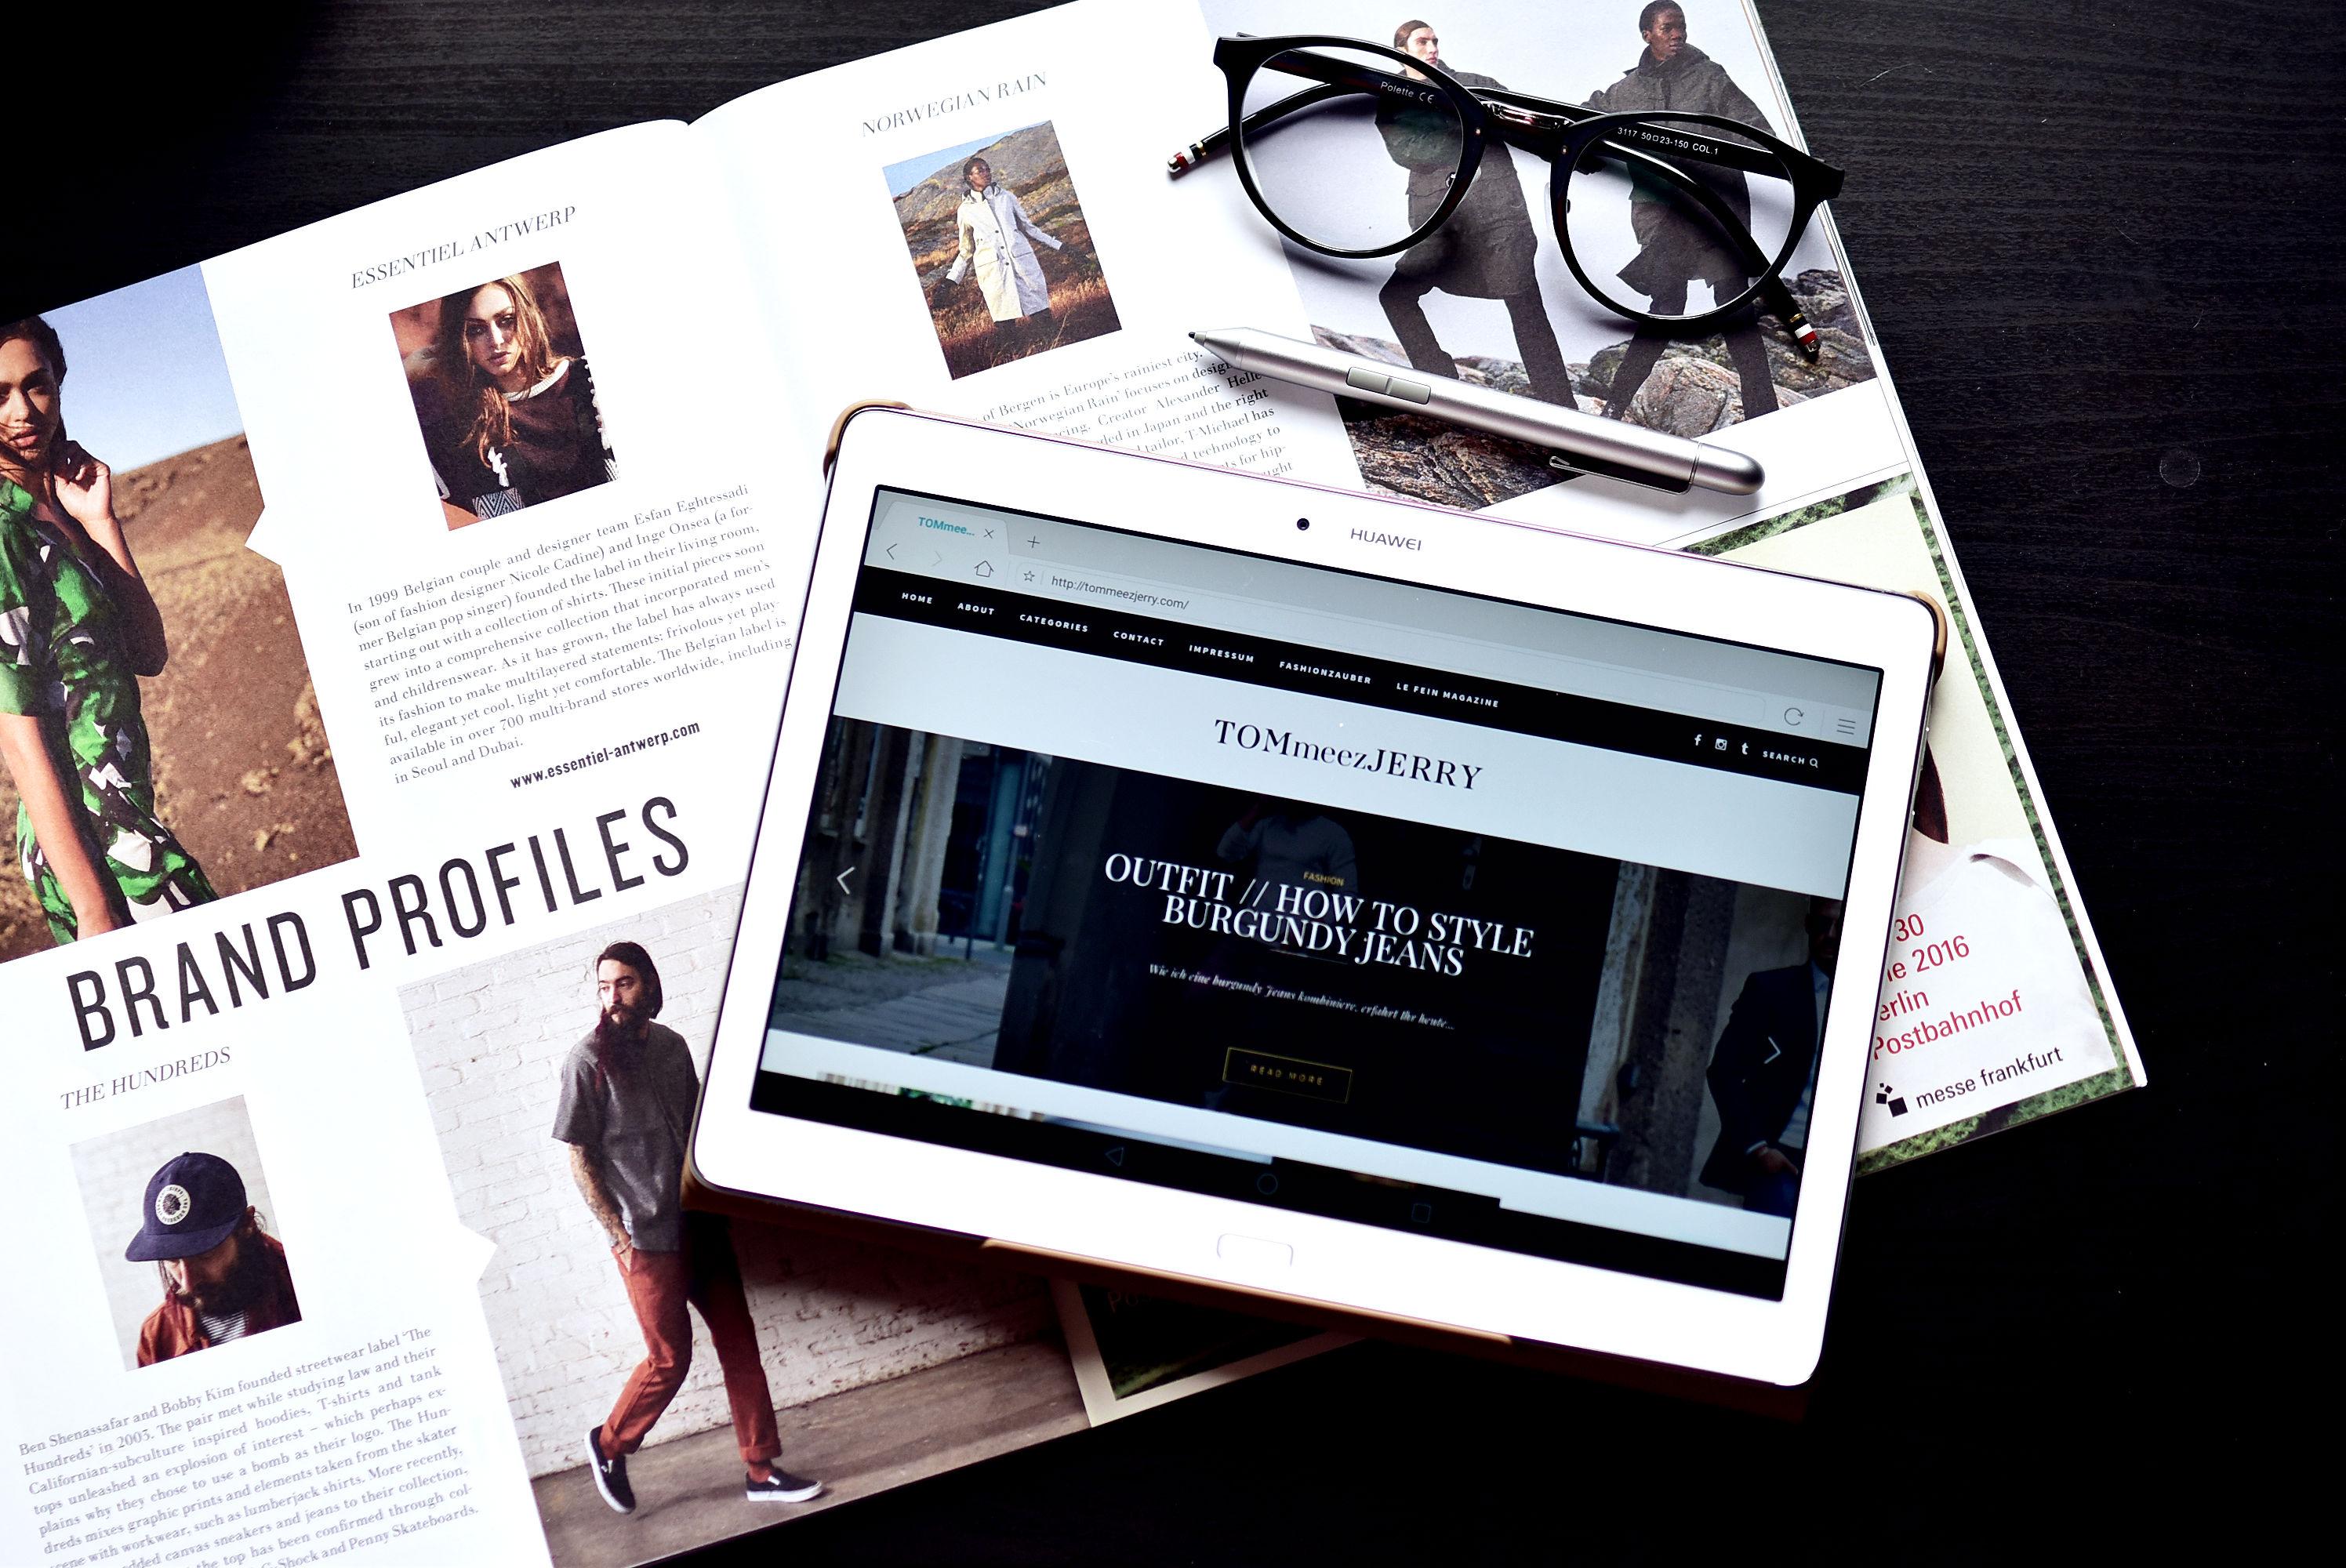 Tommeezjerry-Styleblog-Männerblog-Männer-Modeblog-Berlin-Berlinblog-Männermodeblog-Huawei-MediaPad-M2-10.0-Tablet-Stylus-Essential